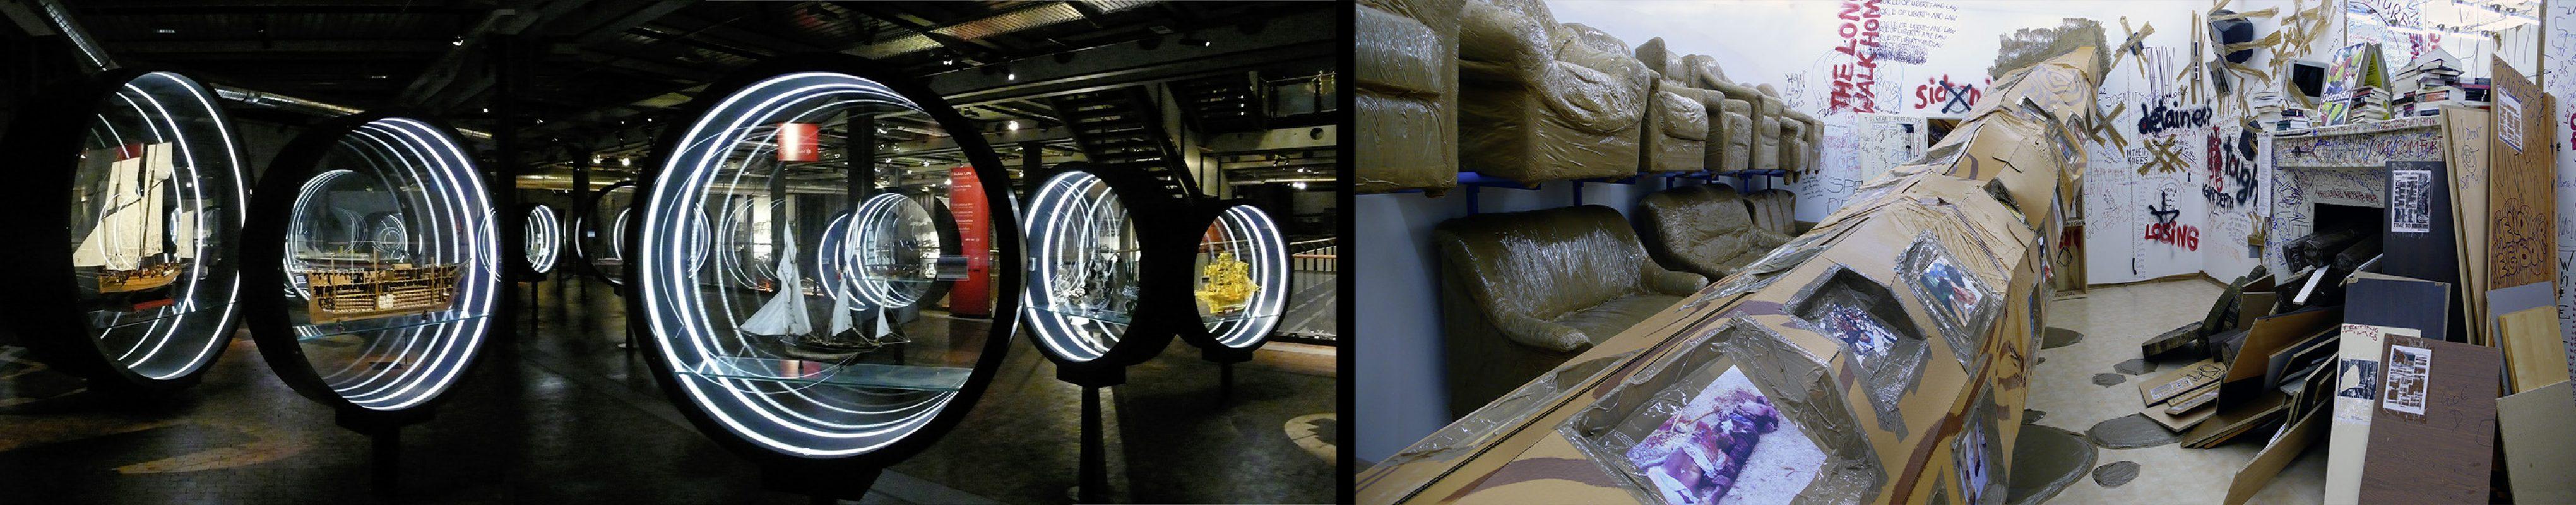 Technik Museum, Galerie Arndt Partner